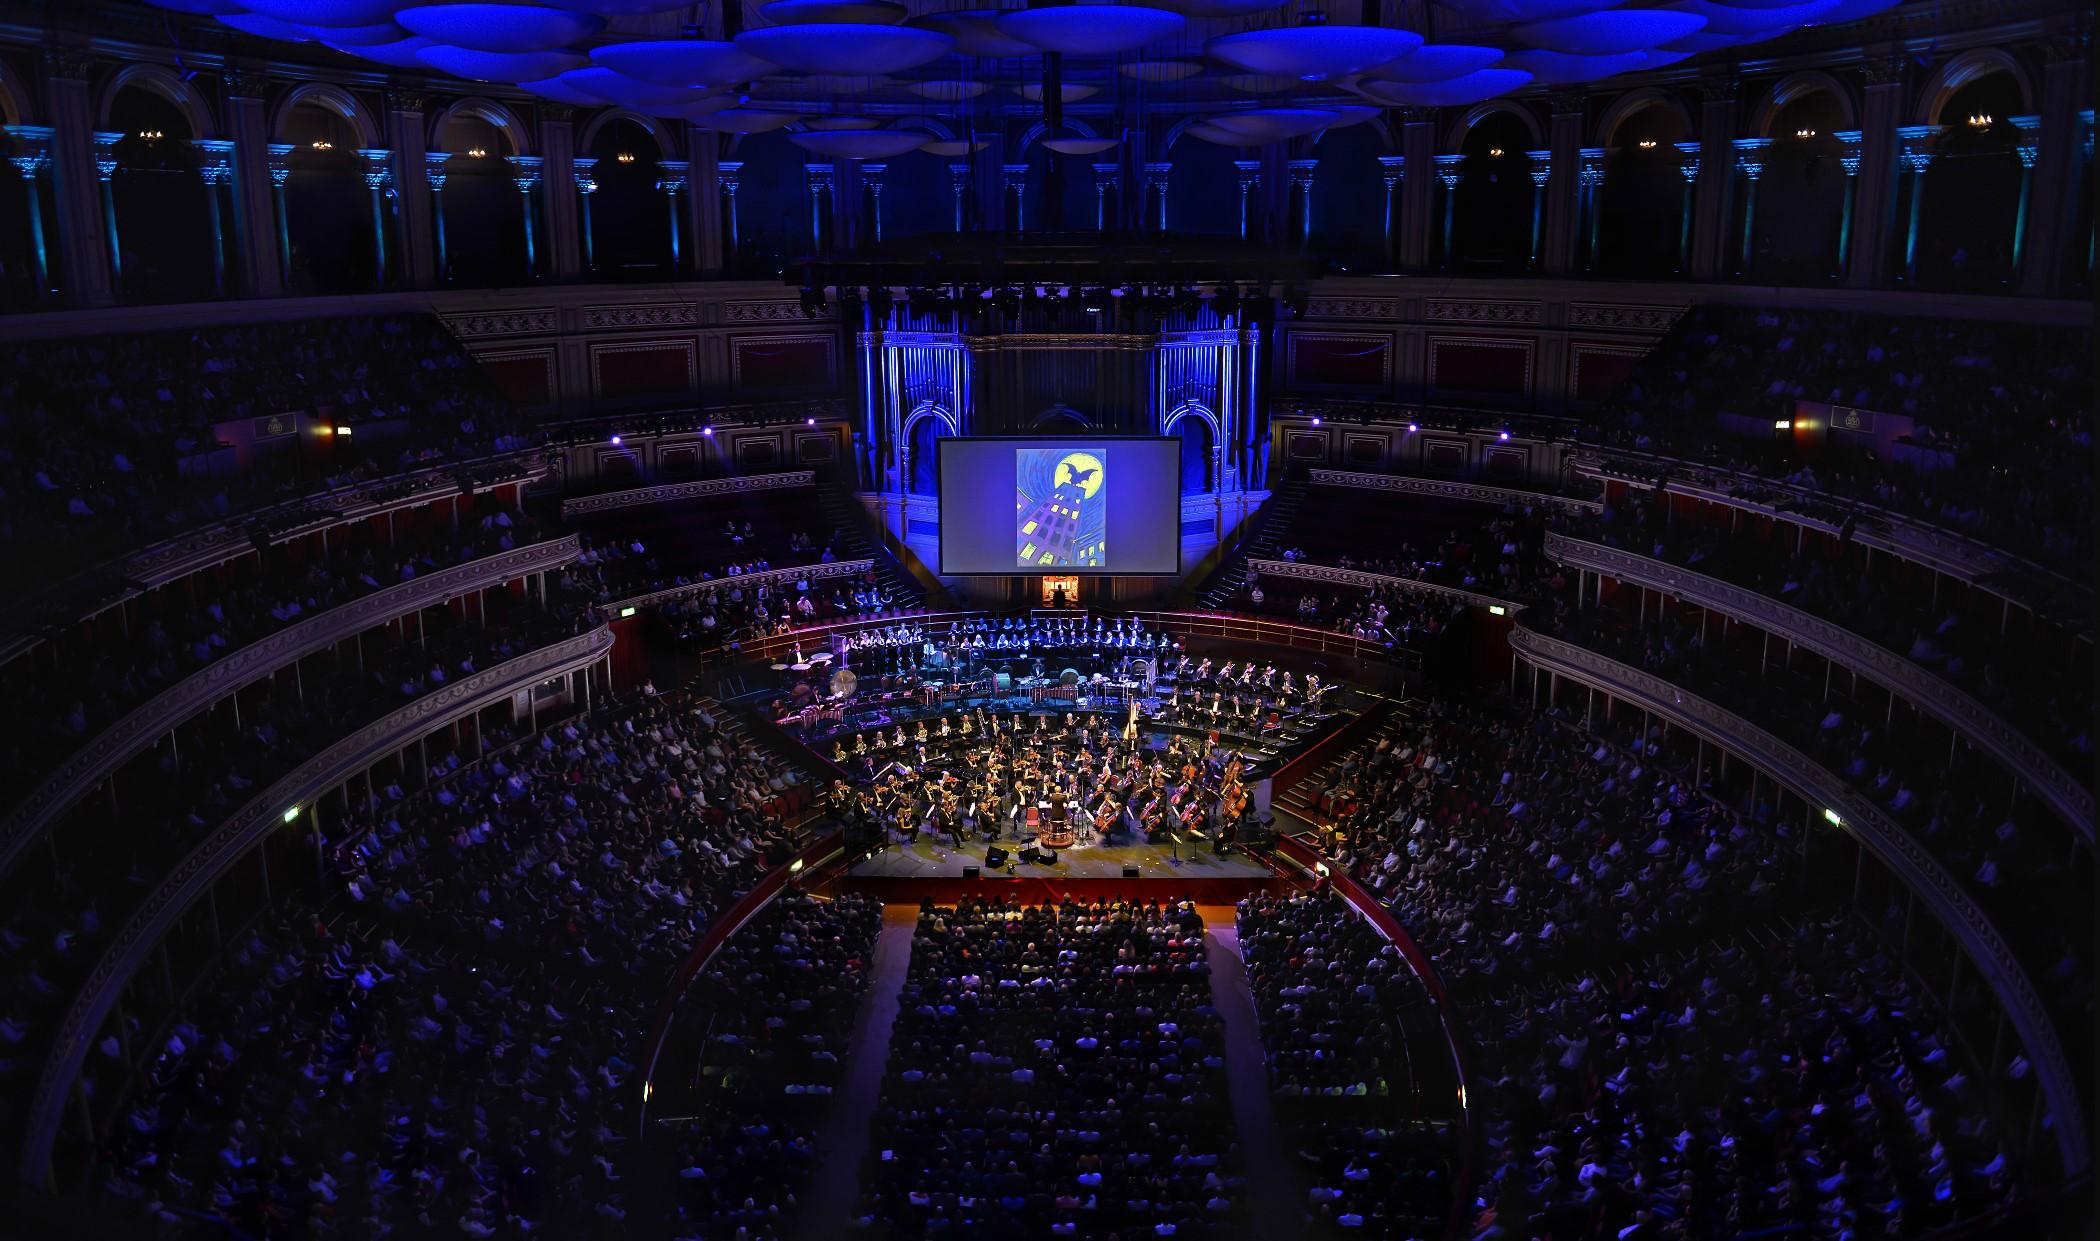 Royal Albert Hall. Danny Elfmans musikk til Tim Burtons filmer.